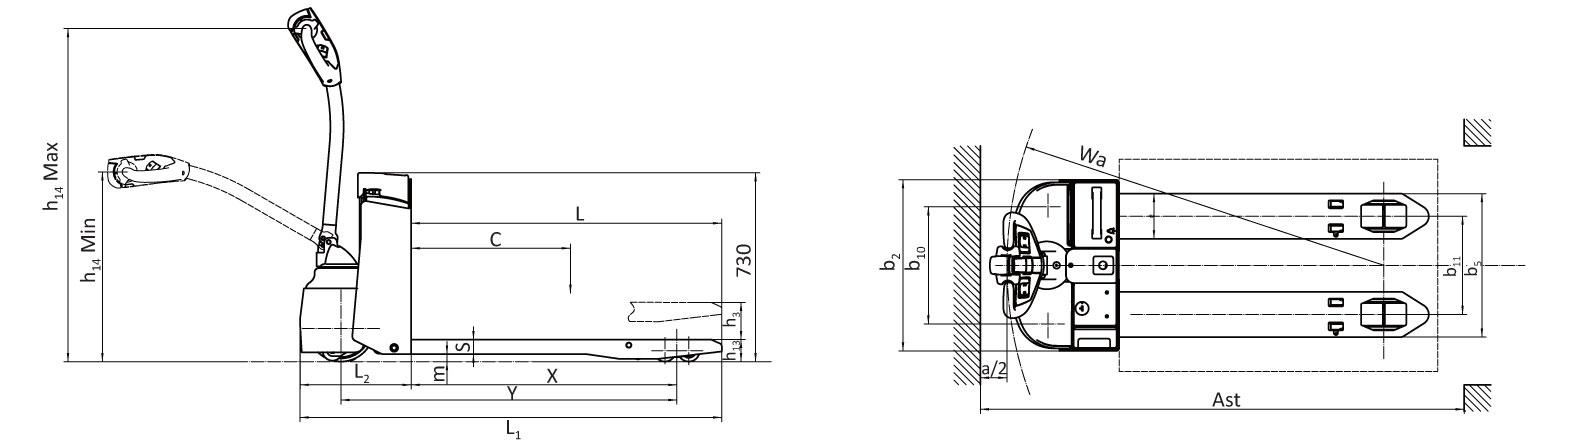 durok-2.0-L1-option.jpg (98 KB)